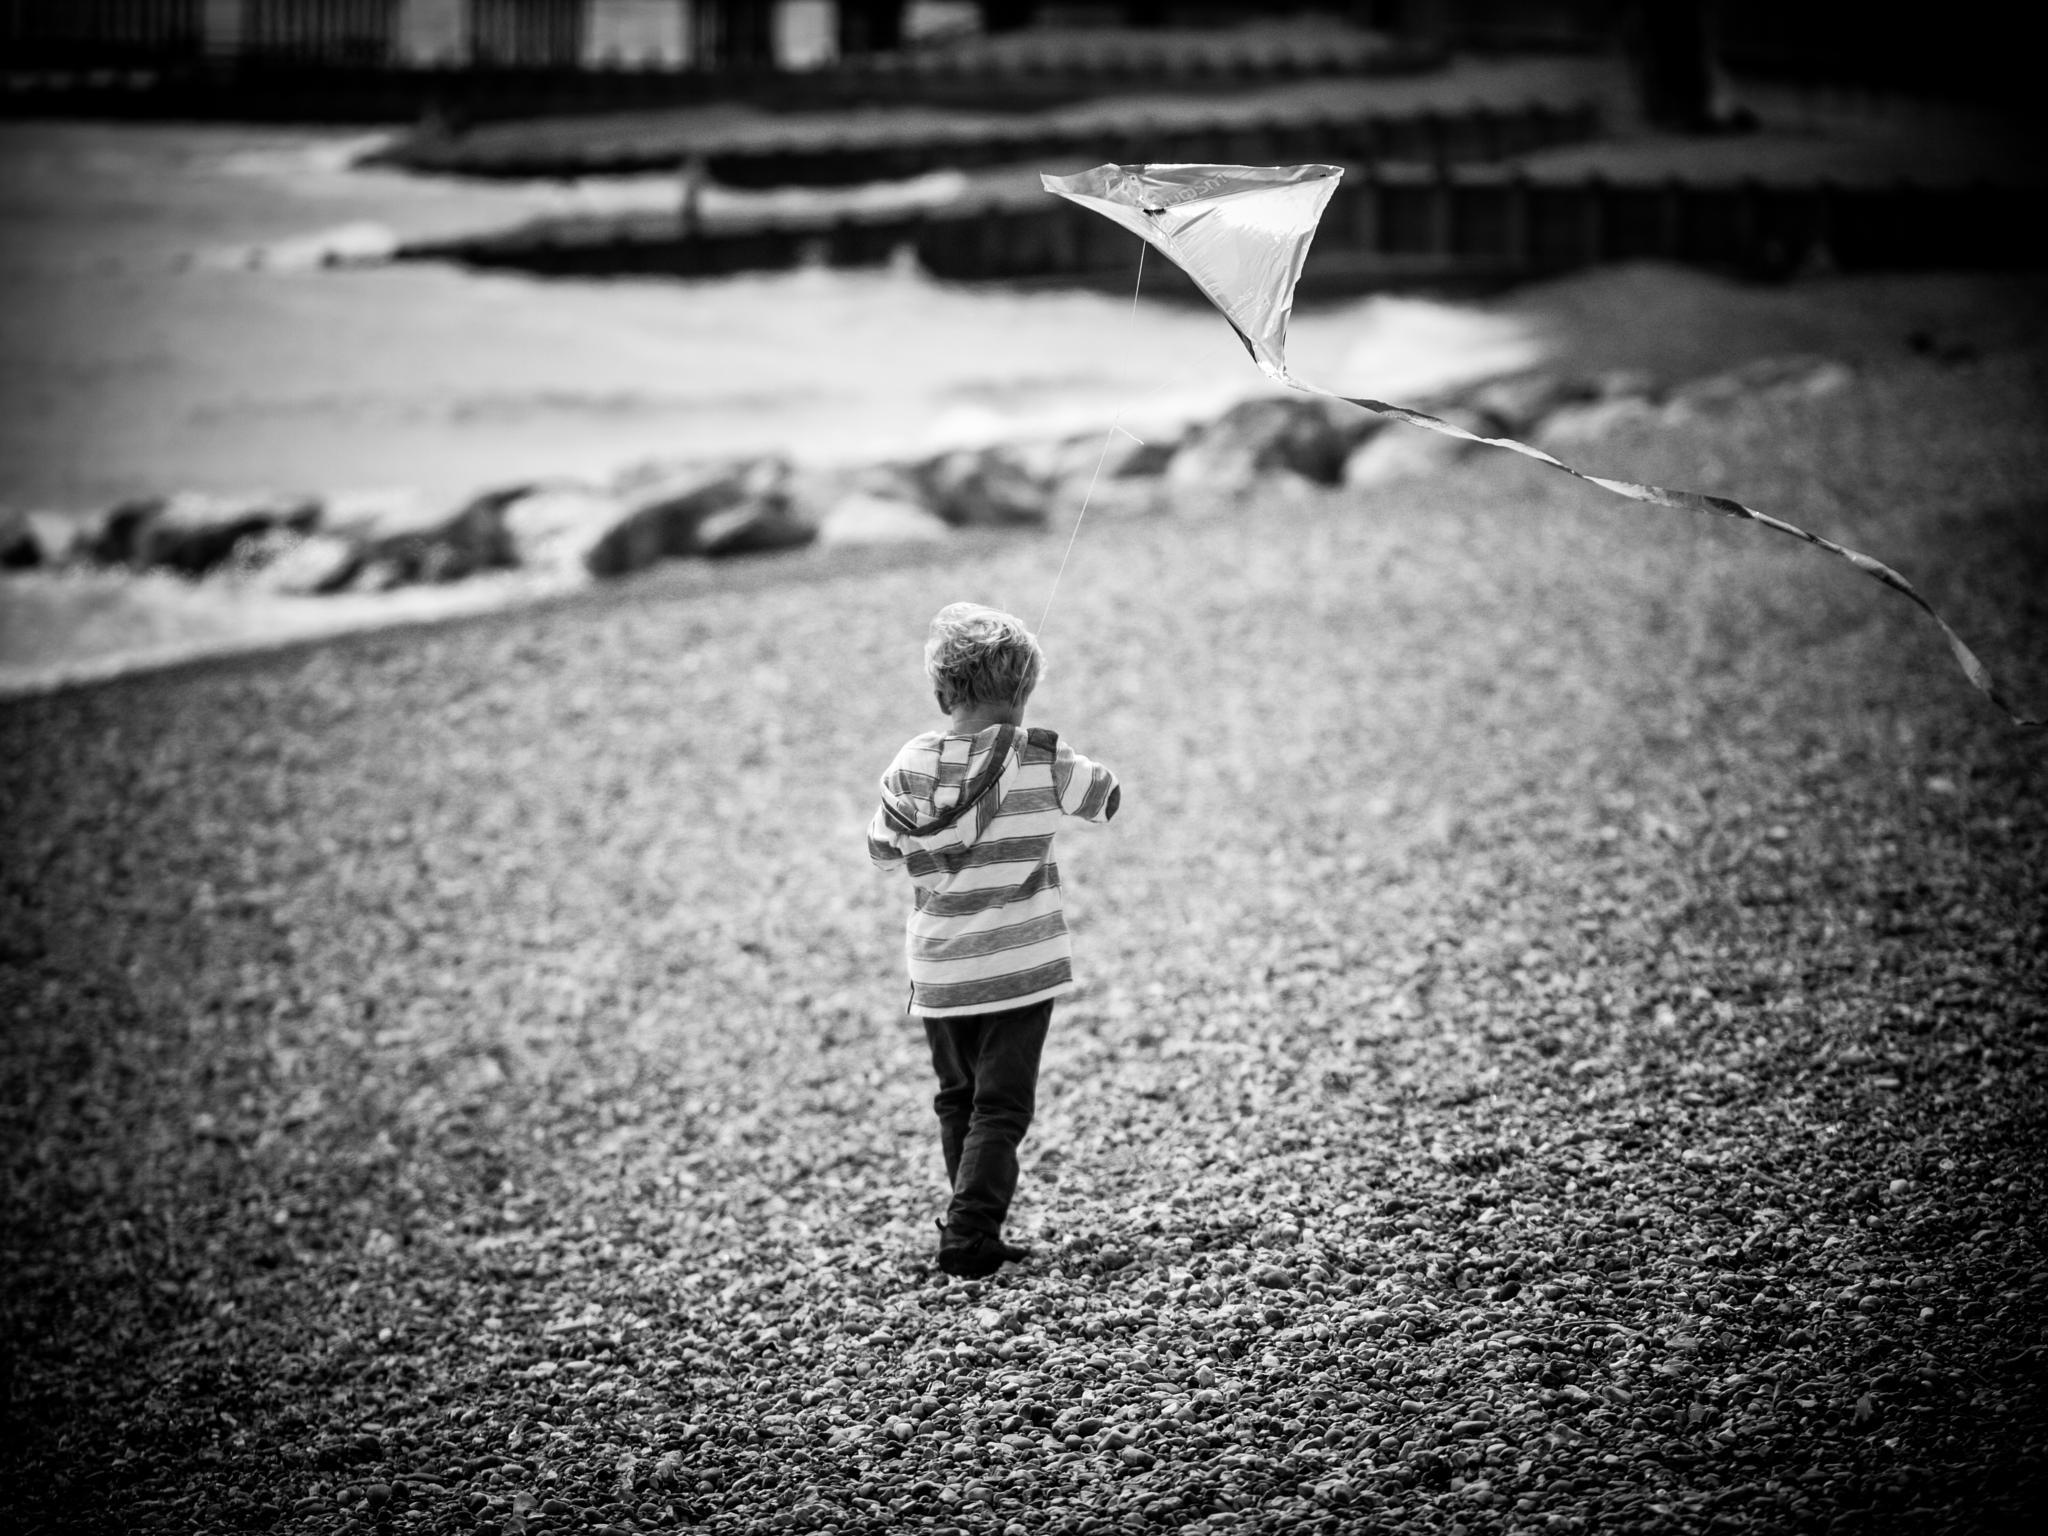 Let it Fly by Alan Wilson